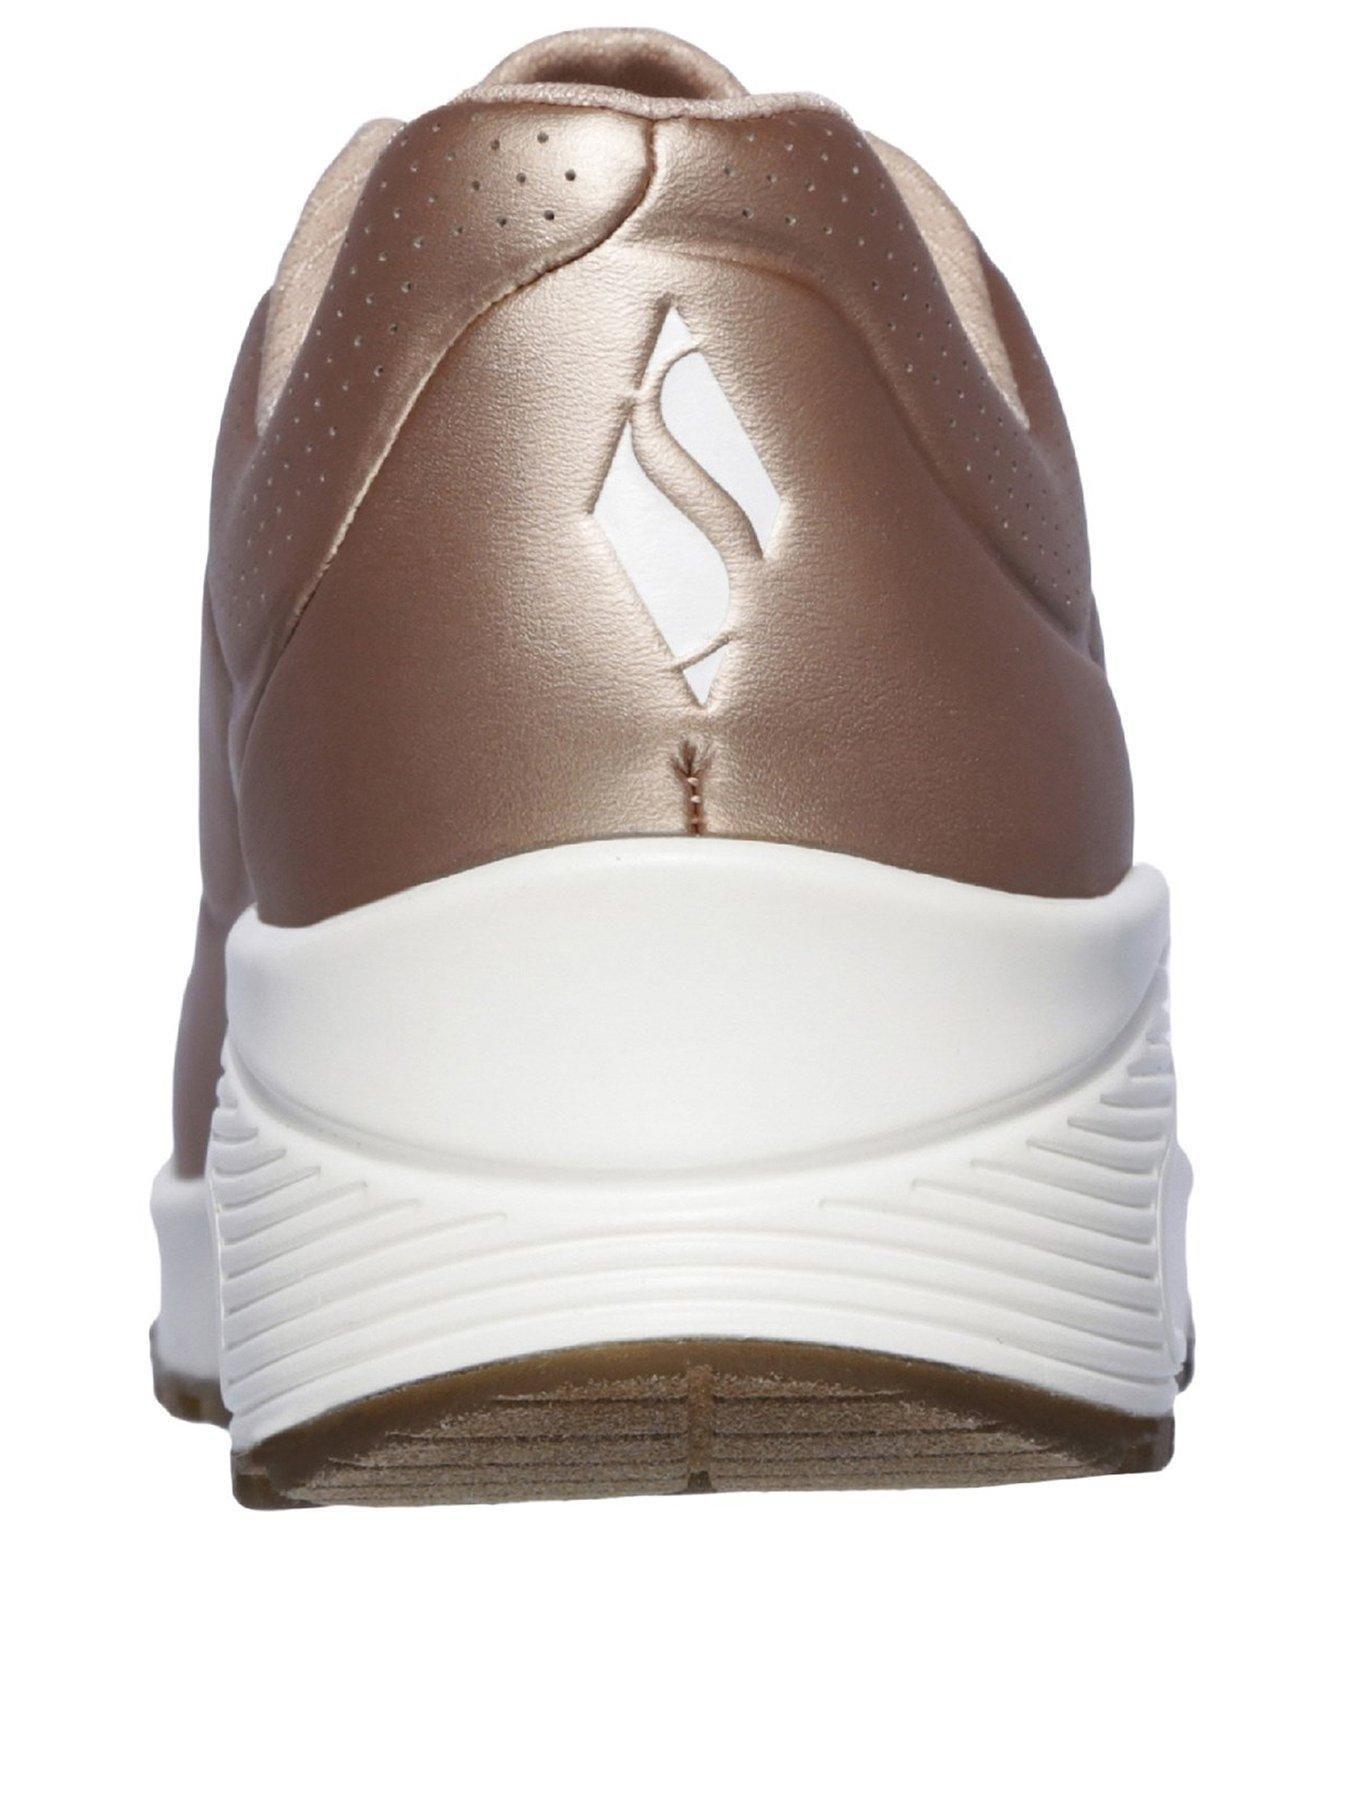 Skechers Uno Rose Bold Trainer | High leg boots, Skechers